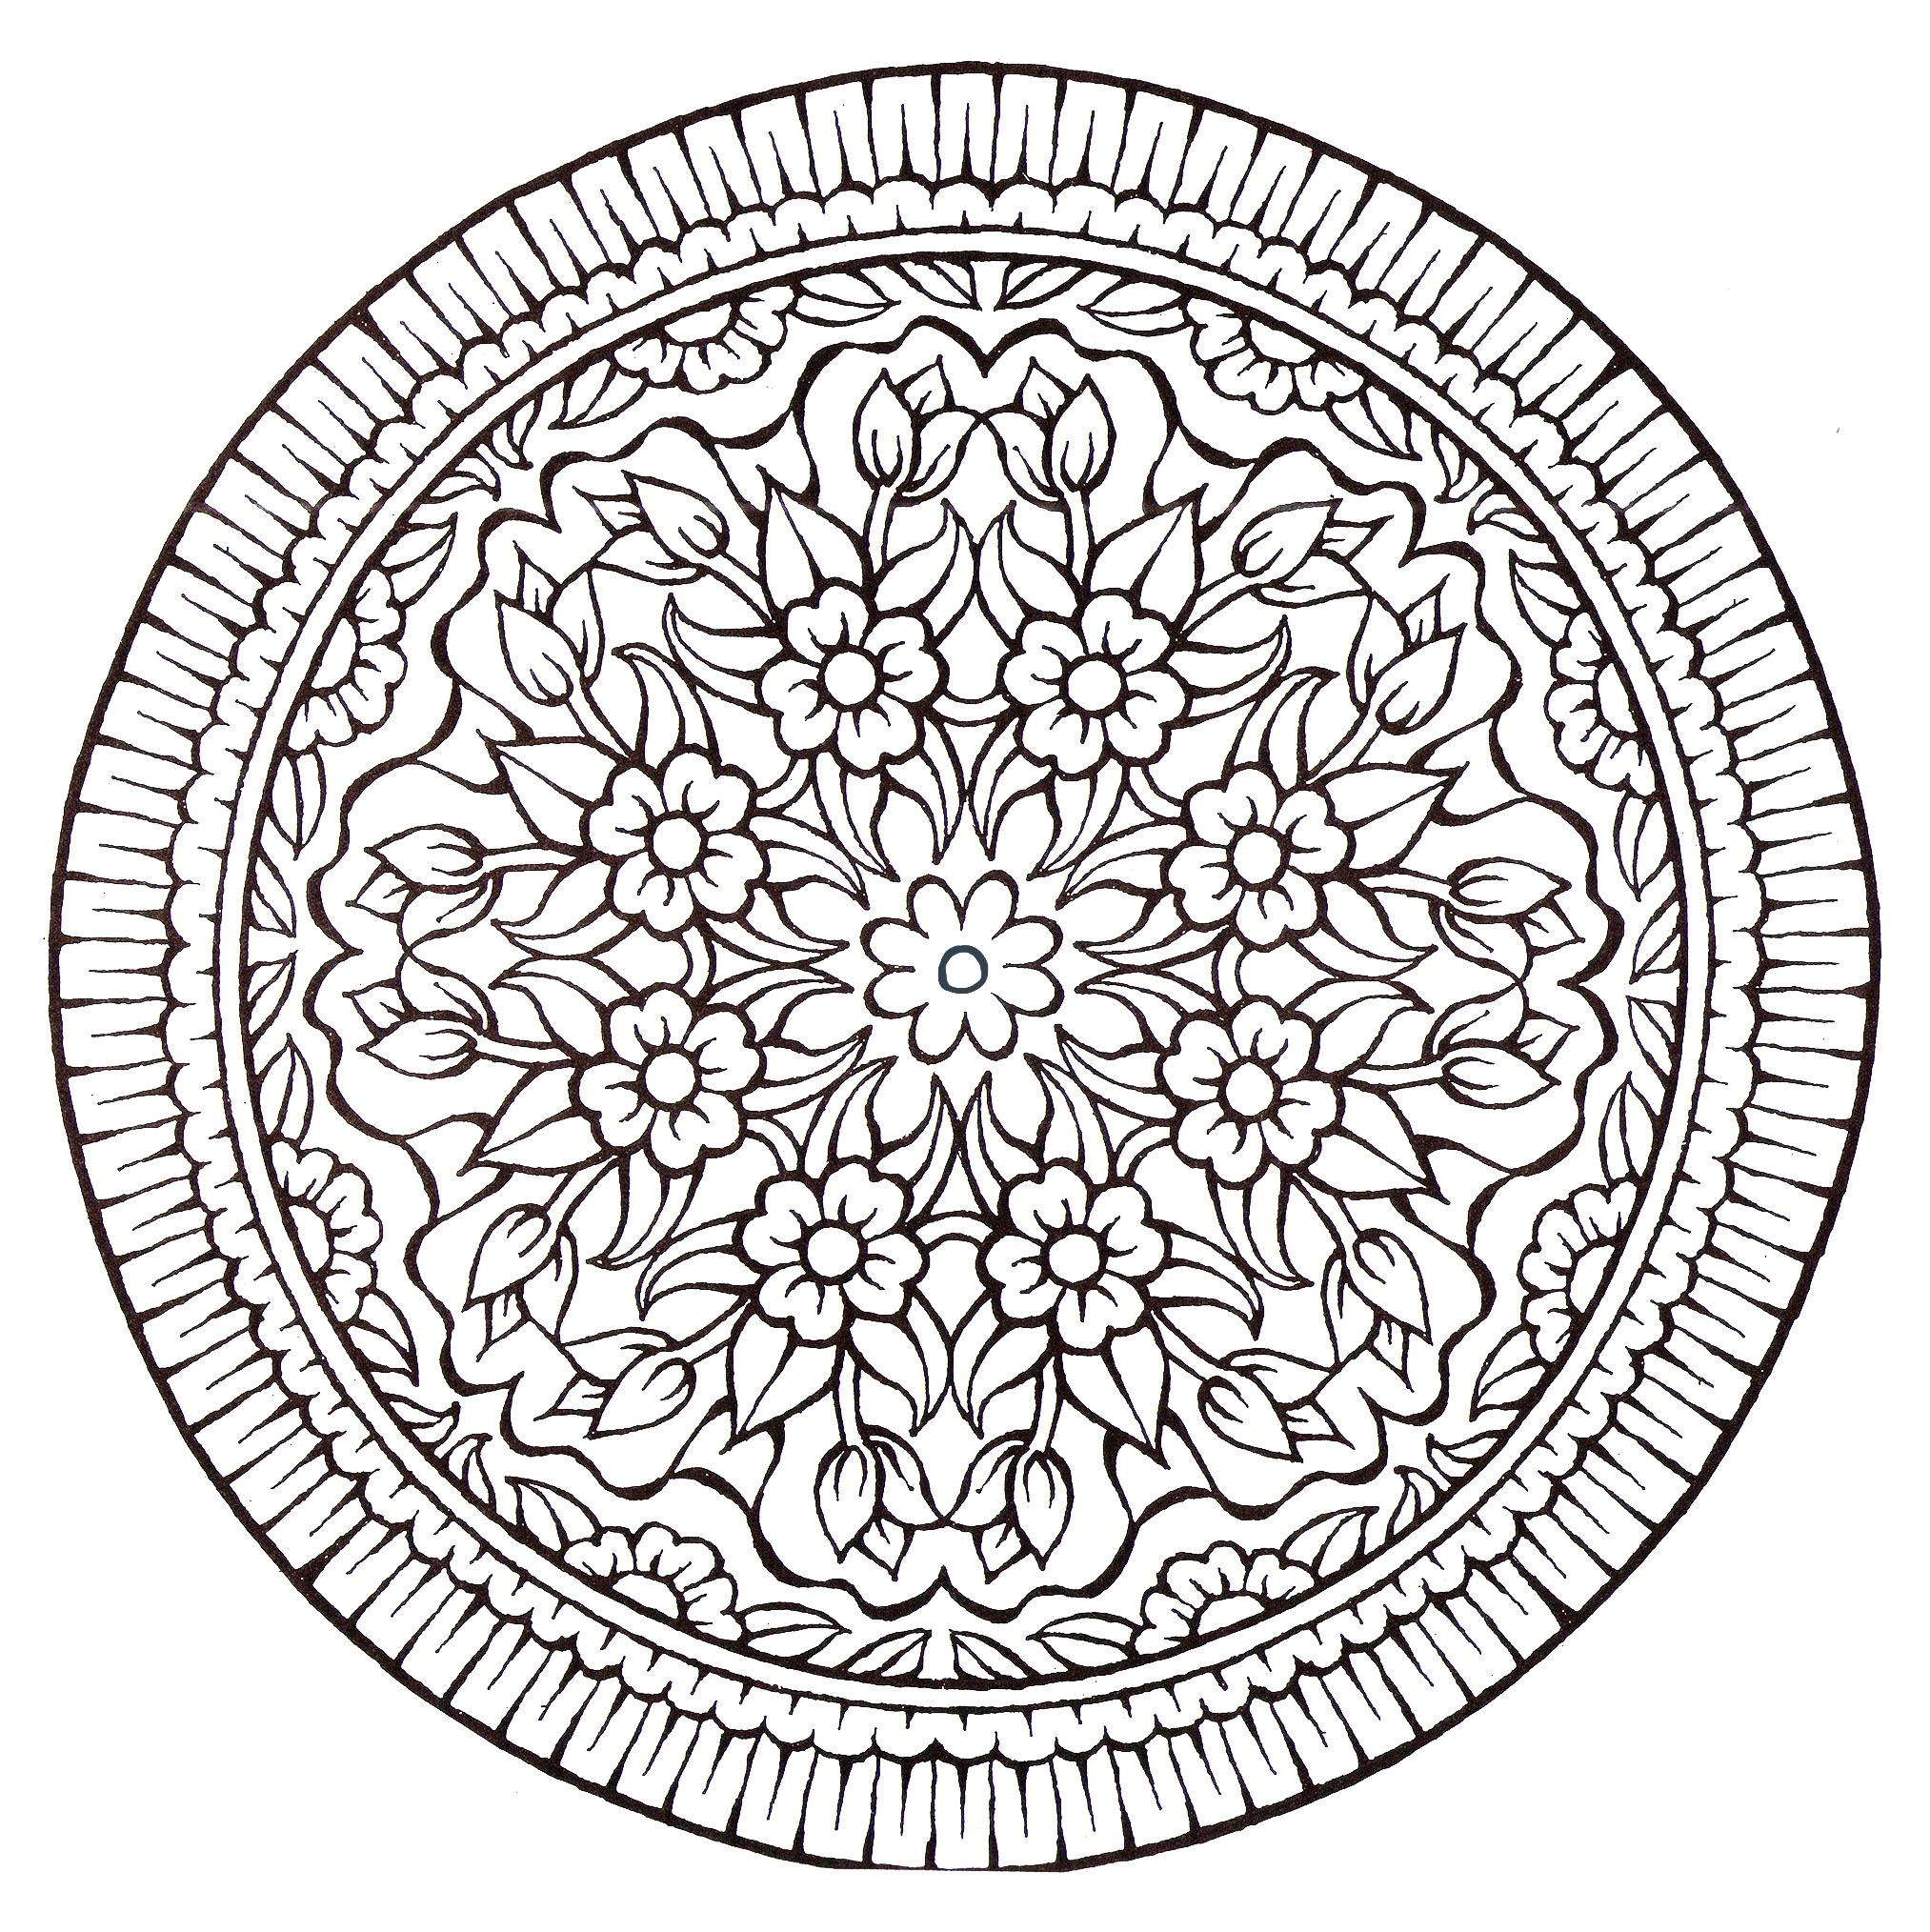 Mandala fleurs vintage coloriage mandalas coloriages - Mandala fleur ...